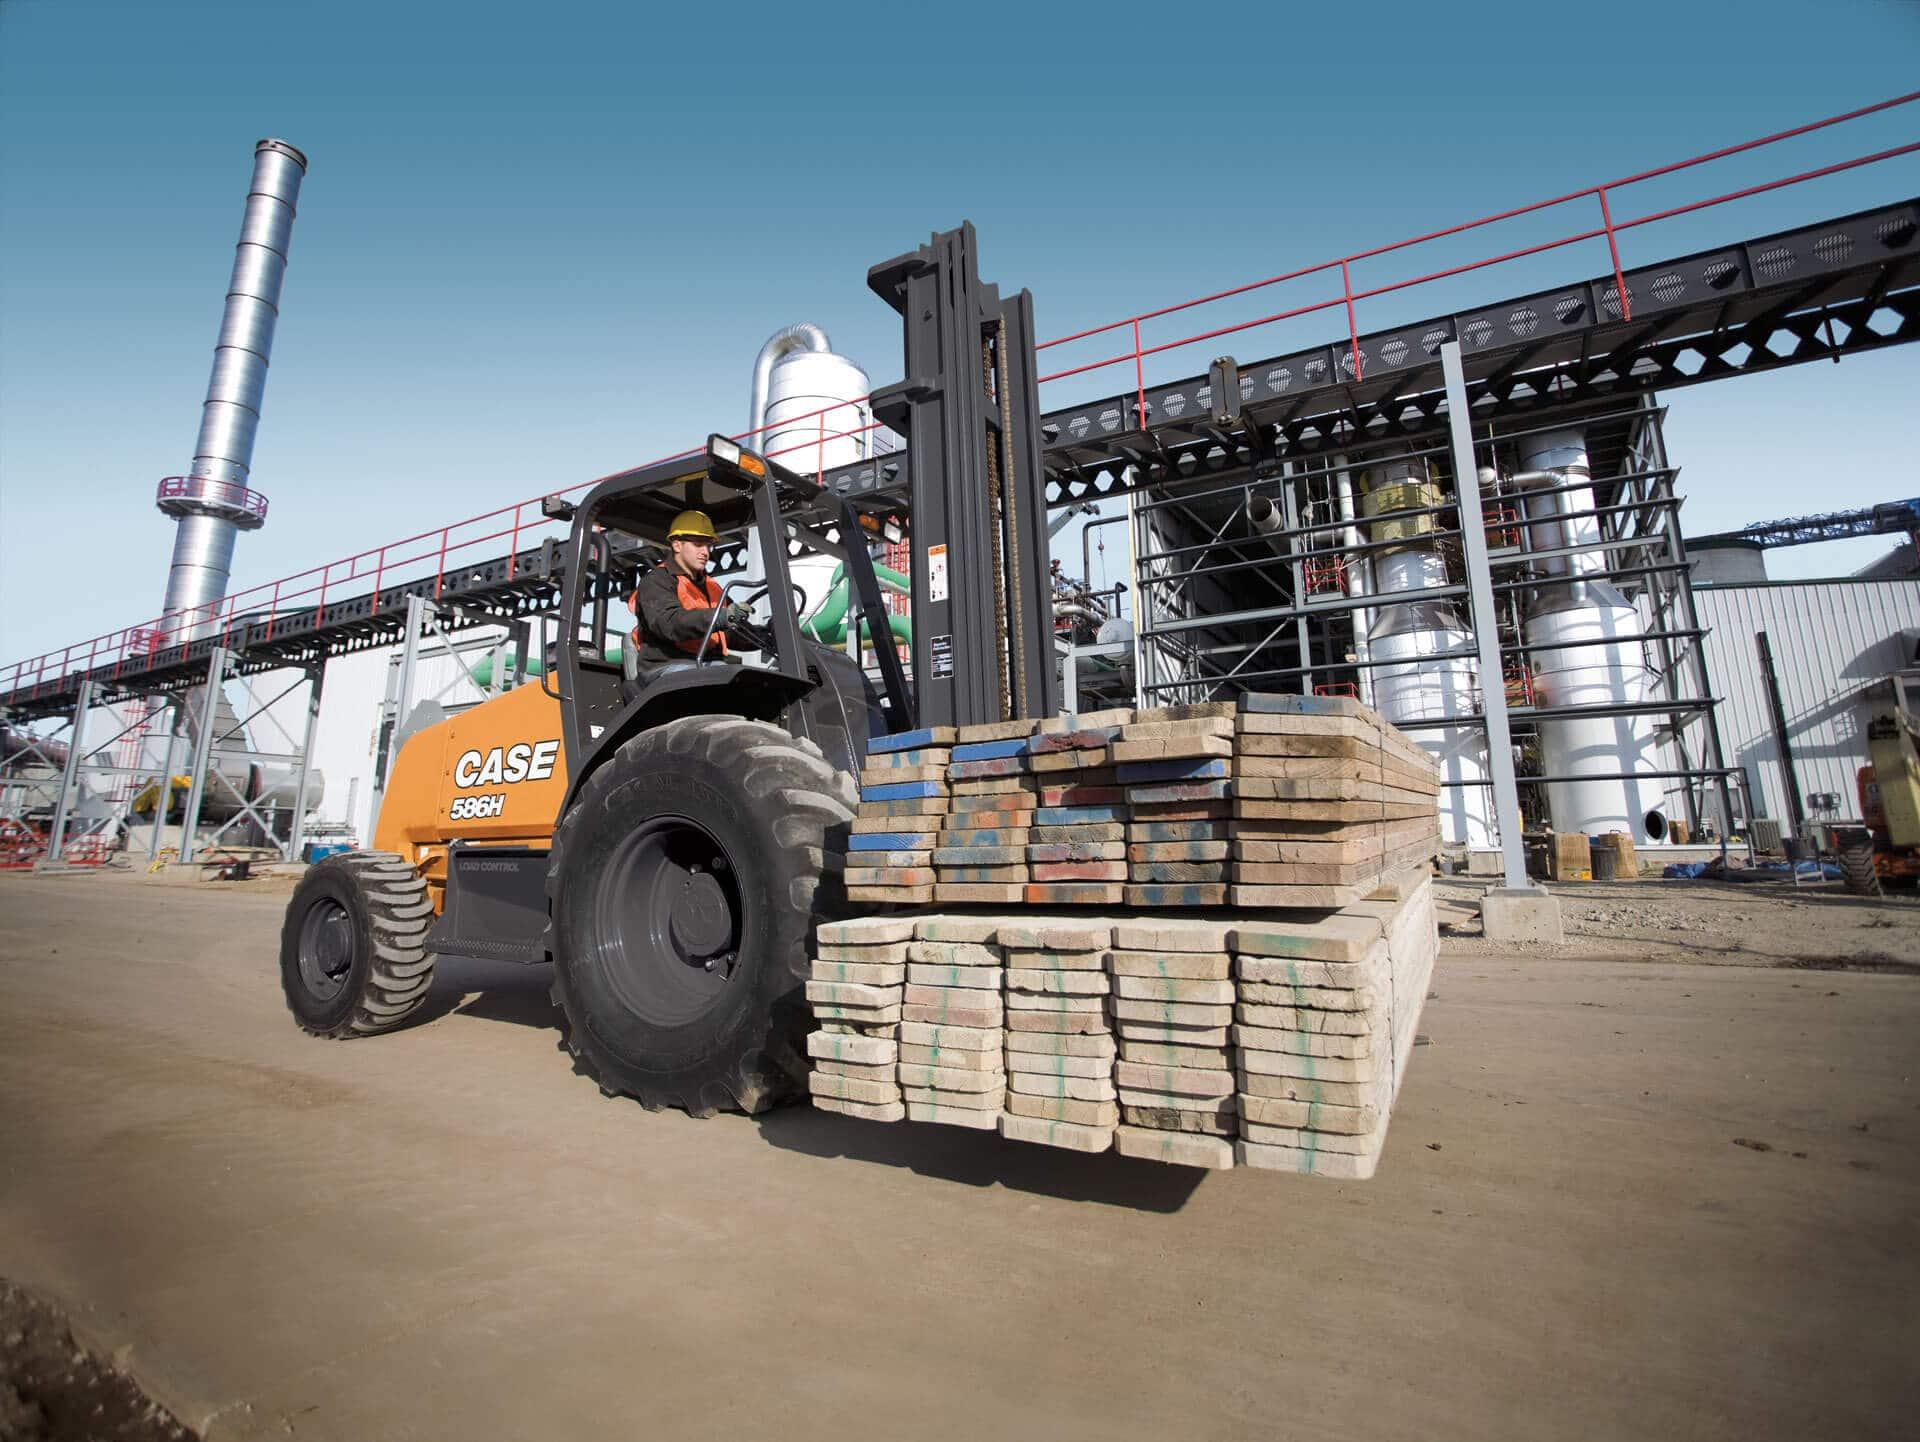 case 586h rough terrain forklift case construction equipment rh casece com Case 588G Specifications Case 586G Fork Lift